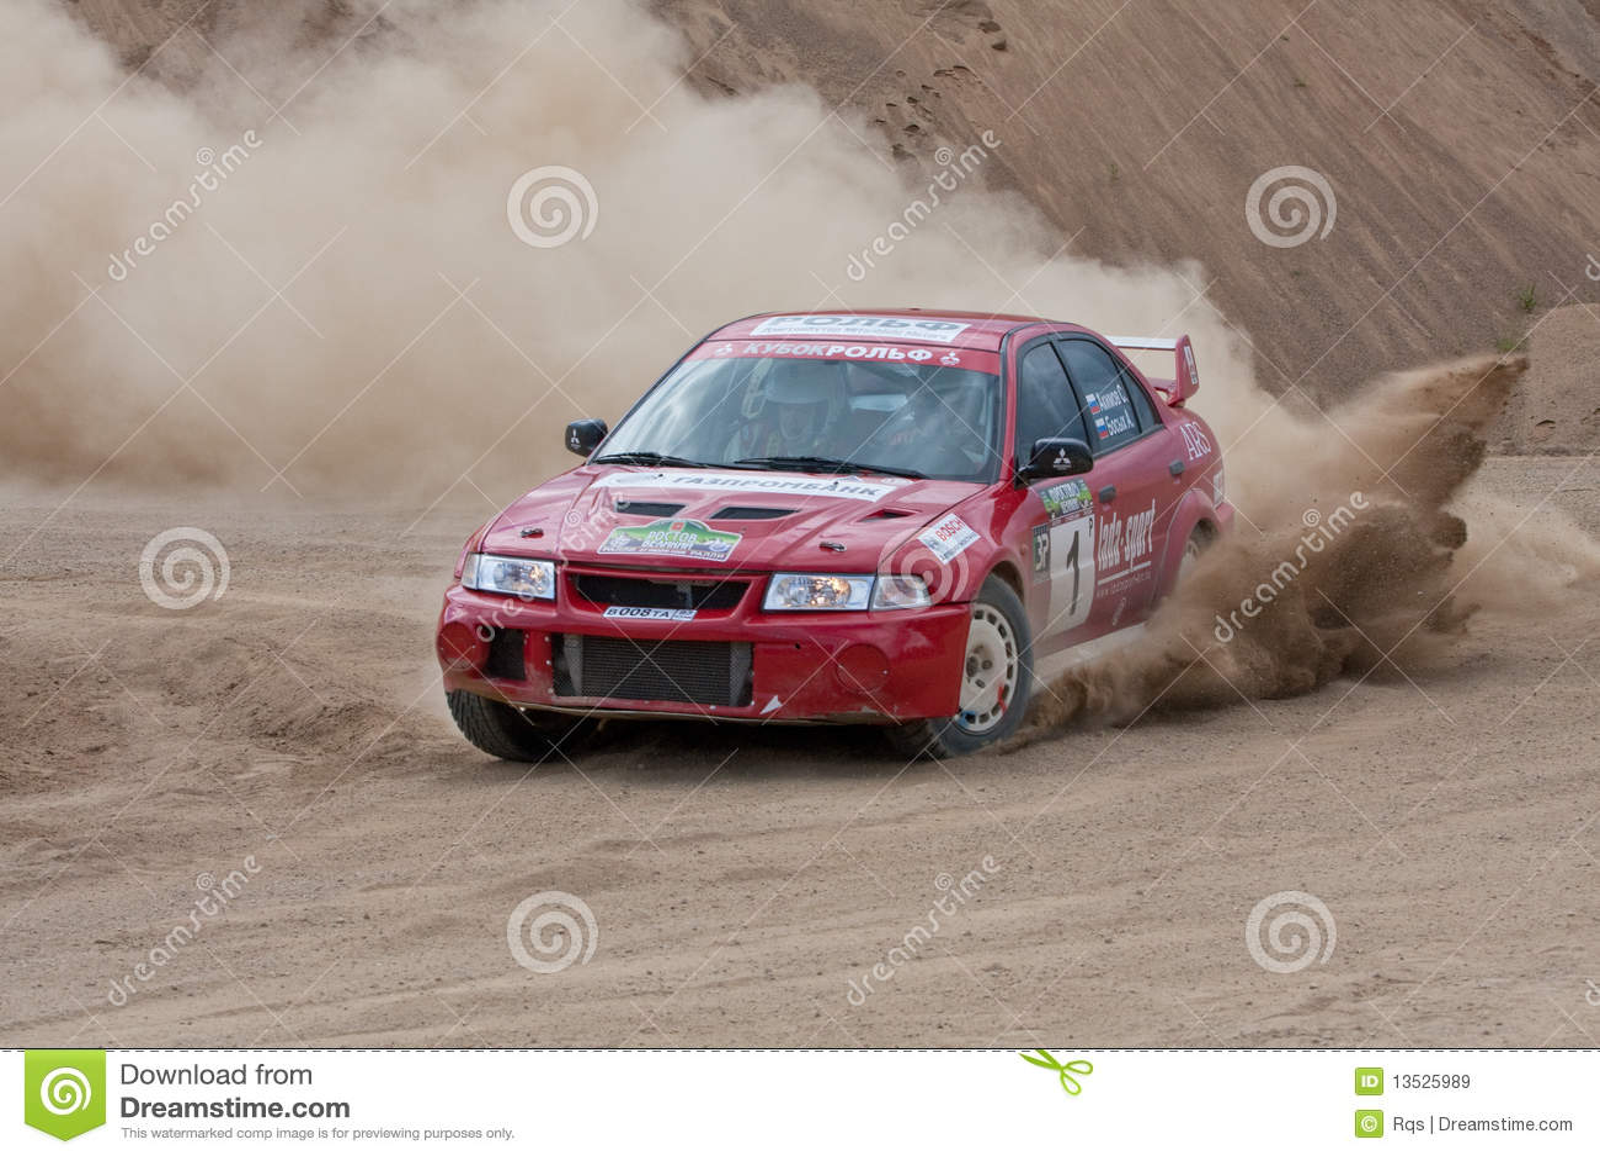 Red Rally Car Mitsubishi Lancer Editorial Stock Image - Image of ...